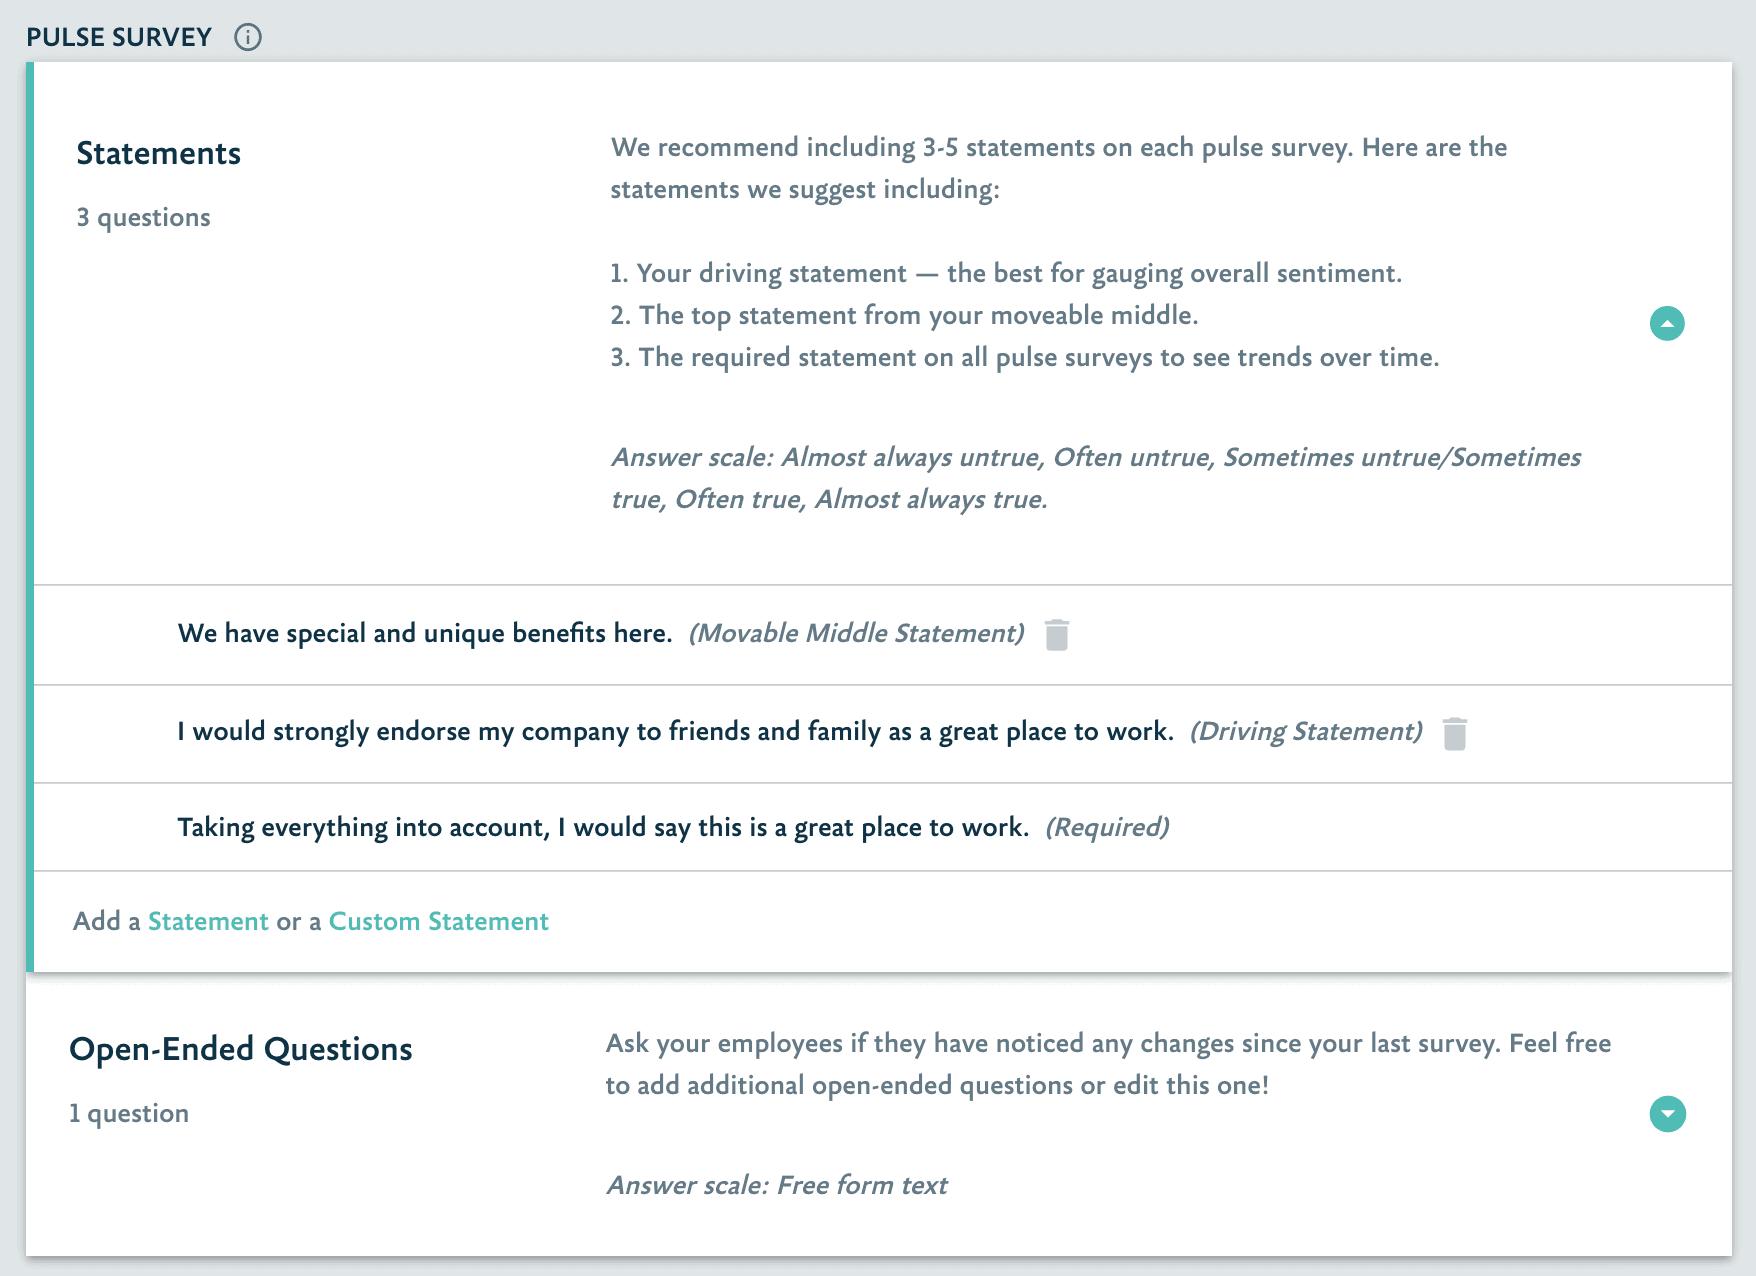 Culture 2 - New Pulse Survey Creation